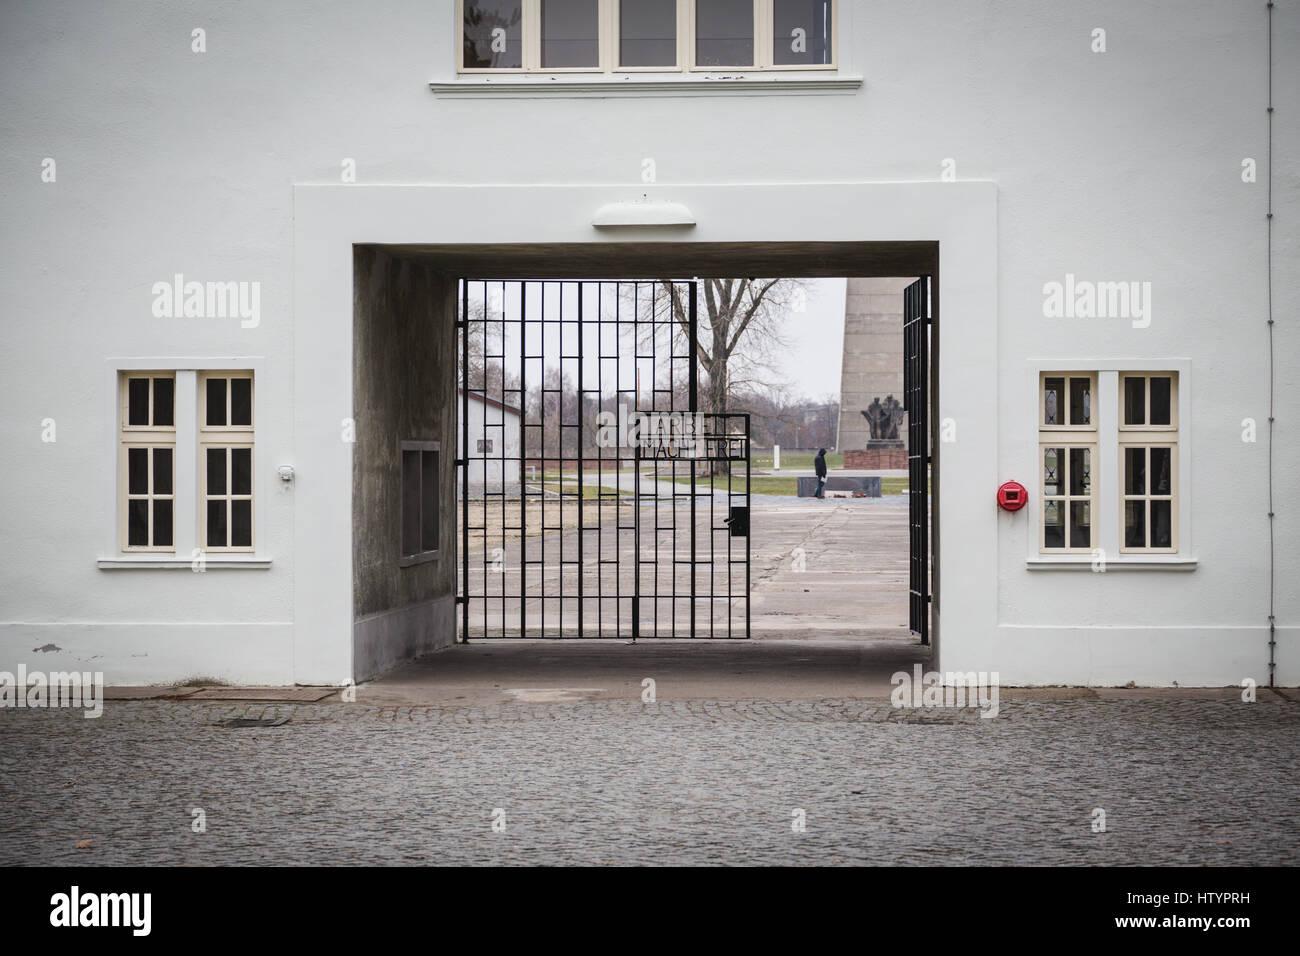 Arbeit Macht Frei Sachsenhausen concentration camp memorial site, Oranienburg, Germany - Stock Image